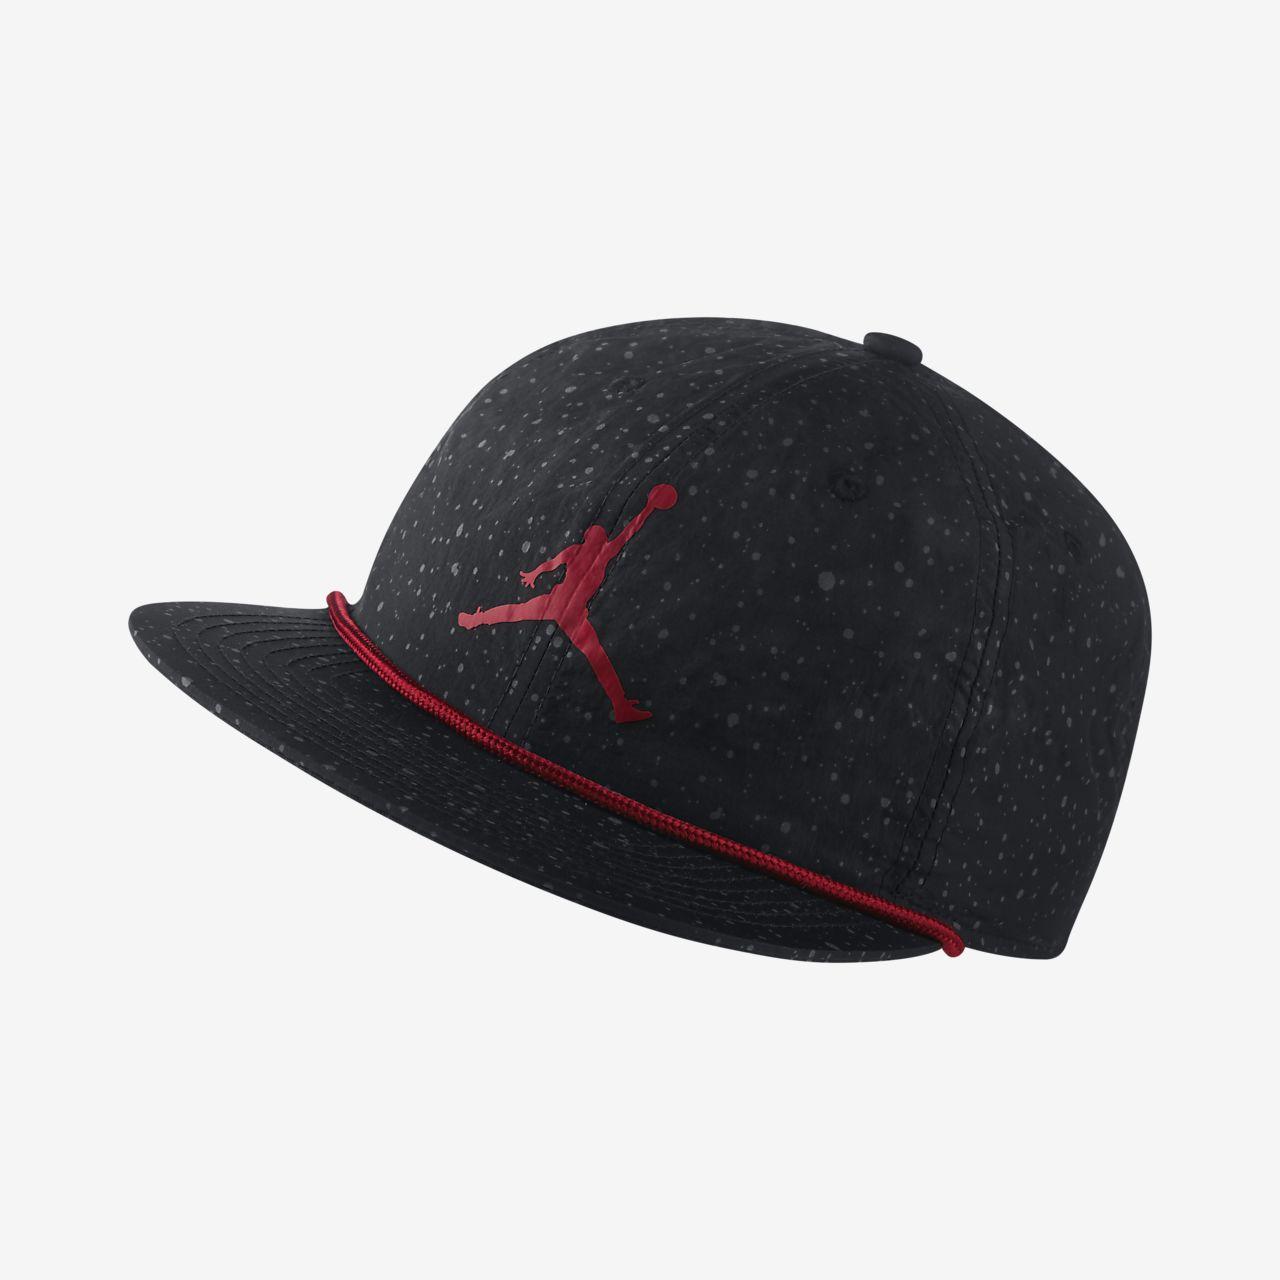 Jordan Pro Poolside 可調式帽款